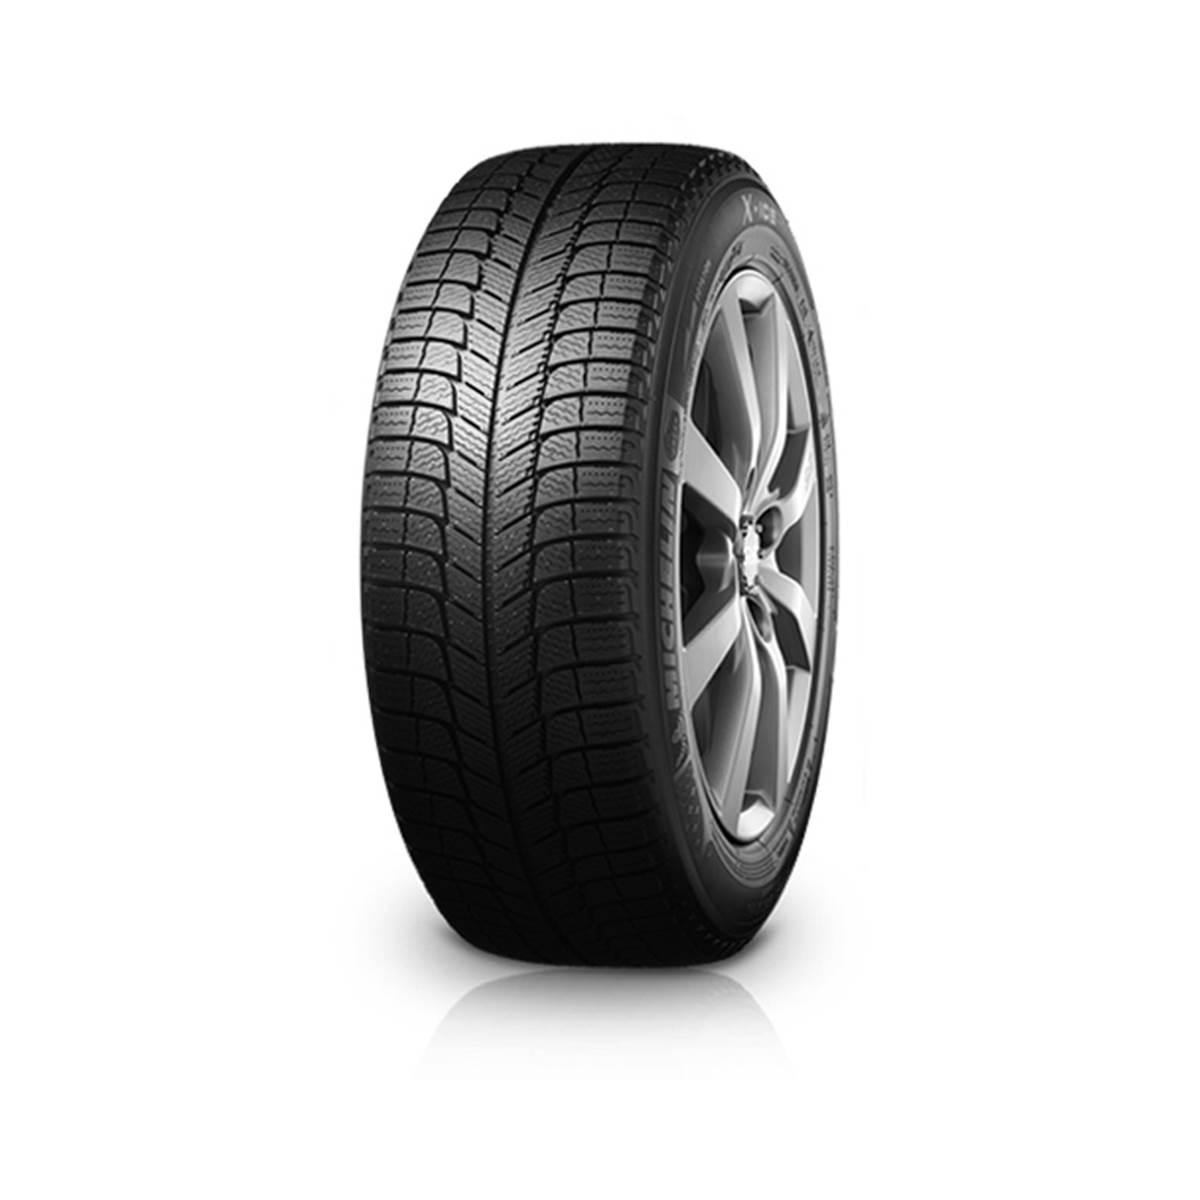 Pneu Hiver Michelin 205/55R16 94H X-Ice Xi3 XL